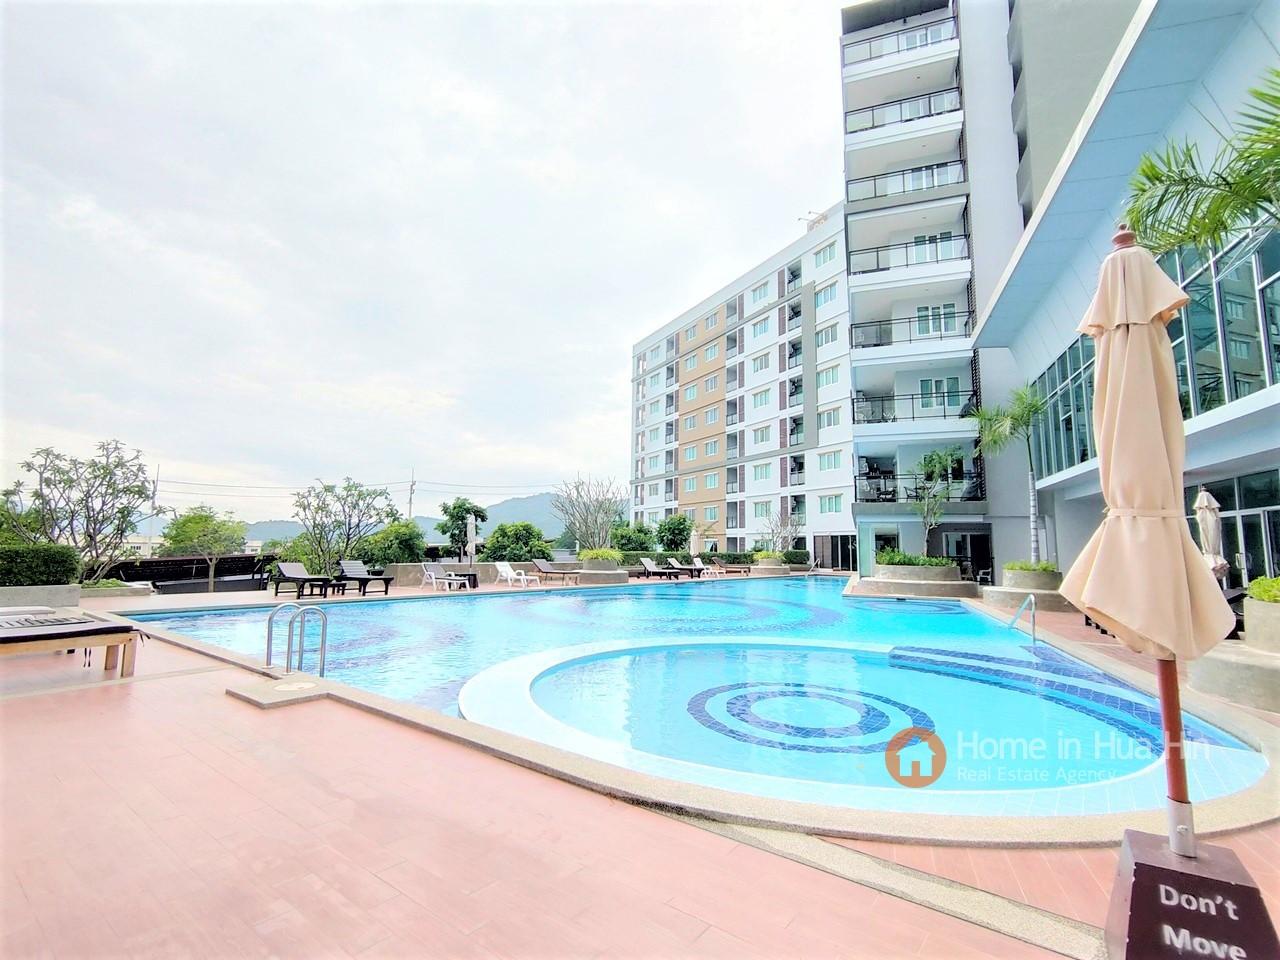 Hua Hin Condo Apartment for SALE 3 Bedroom